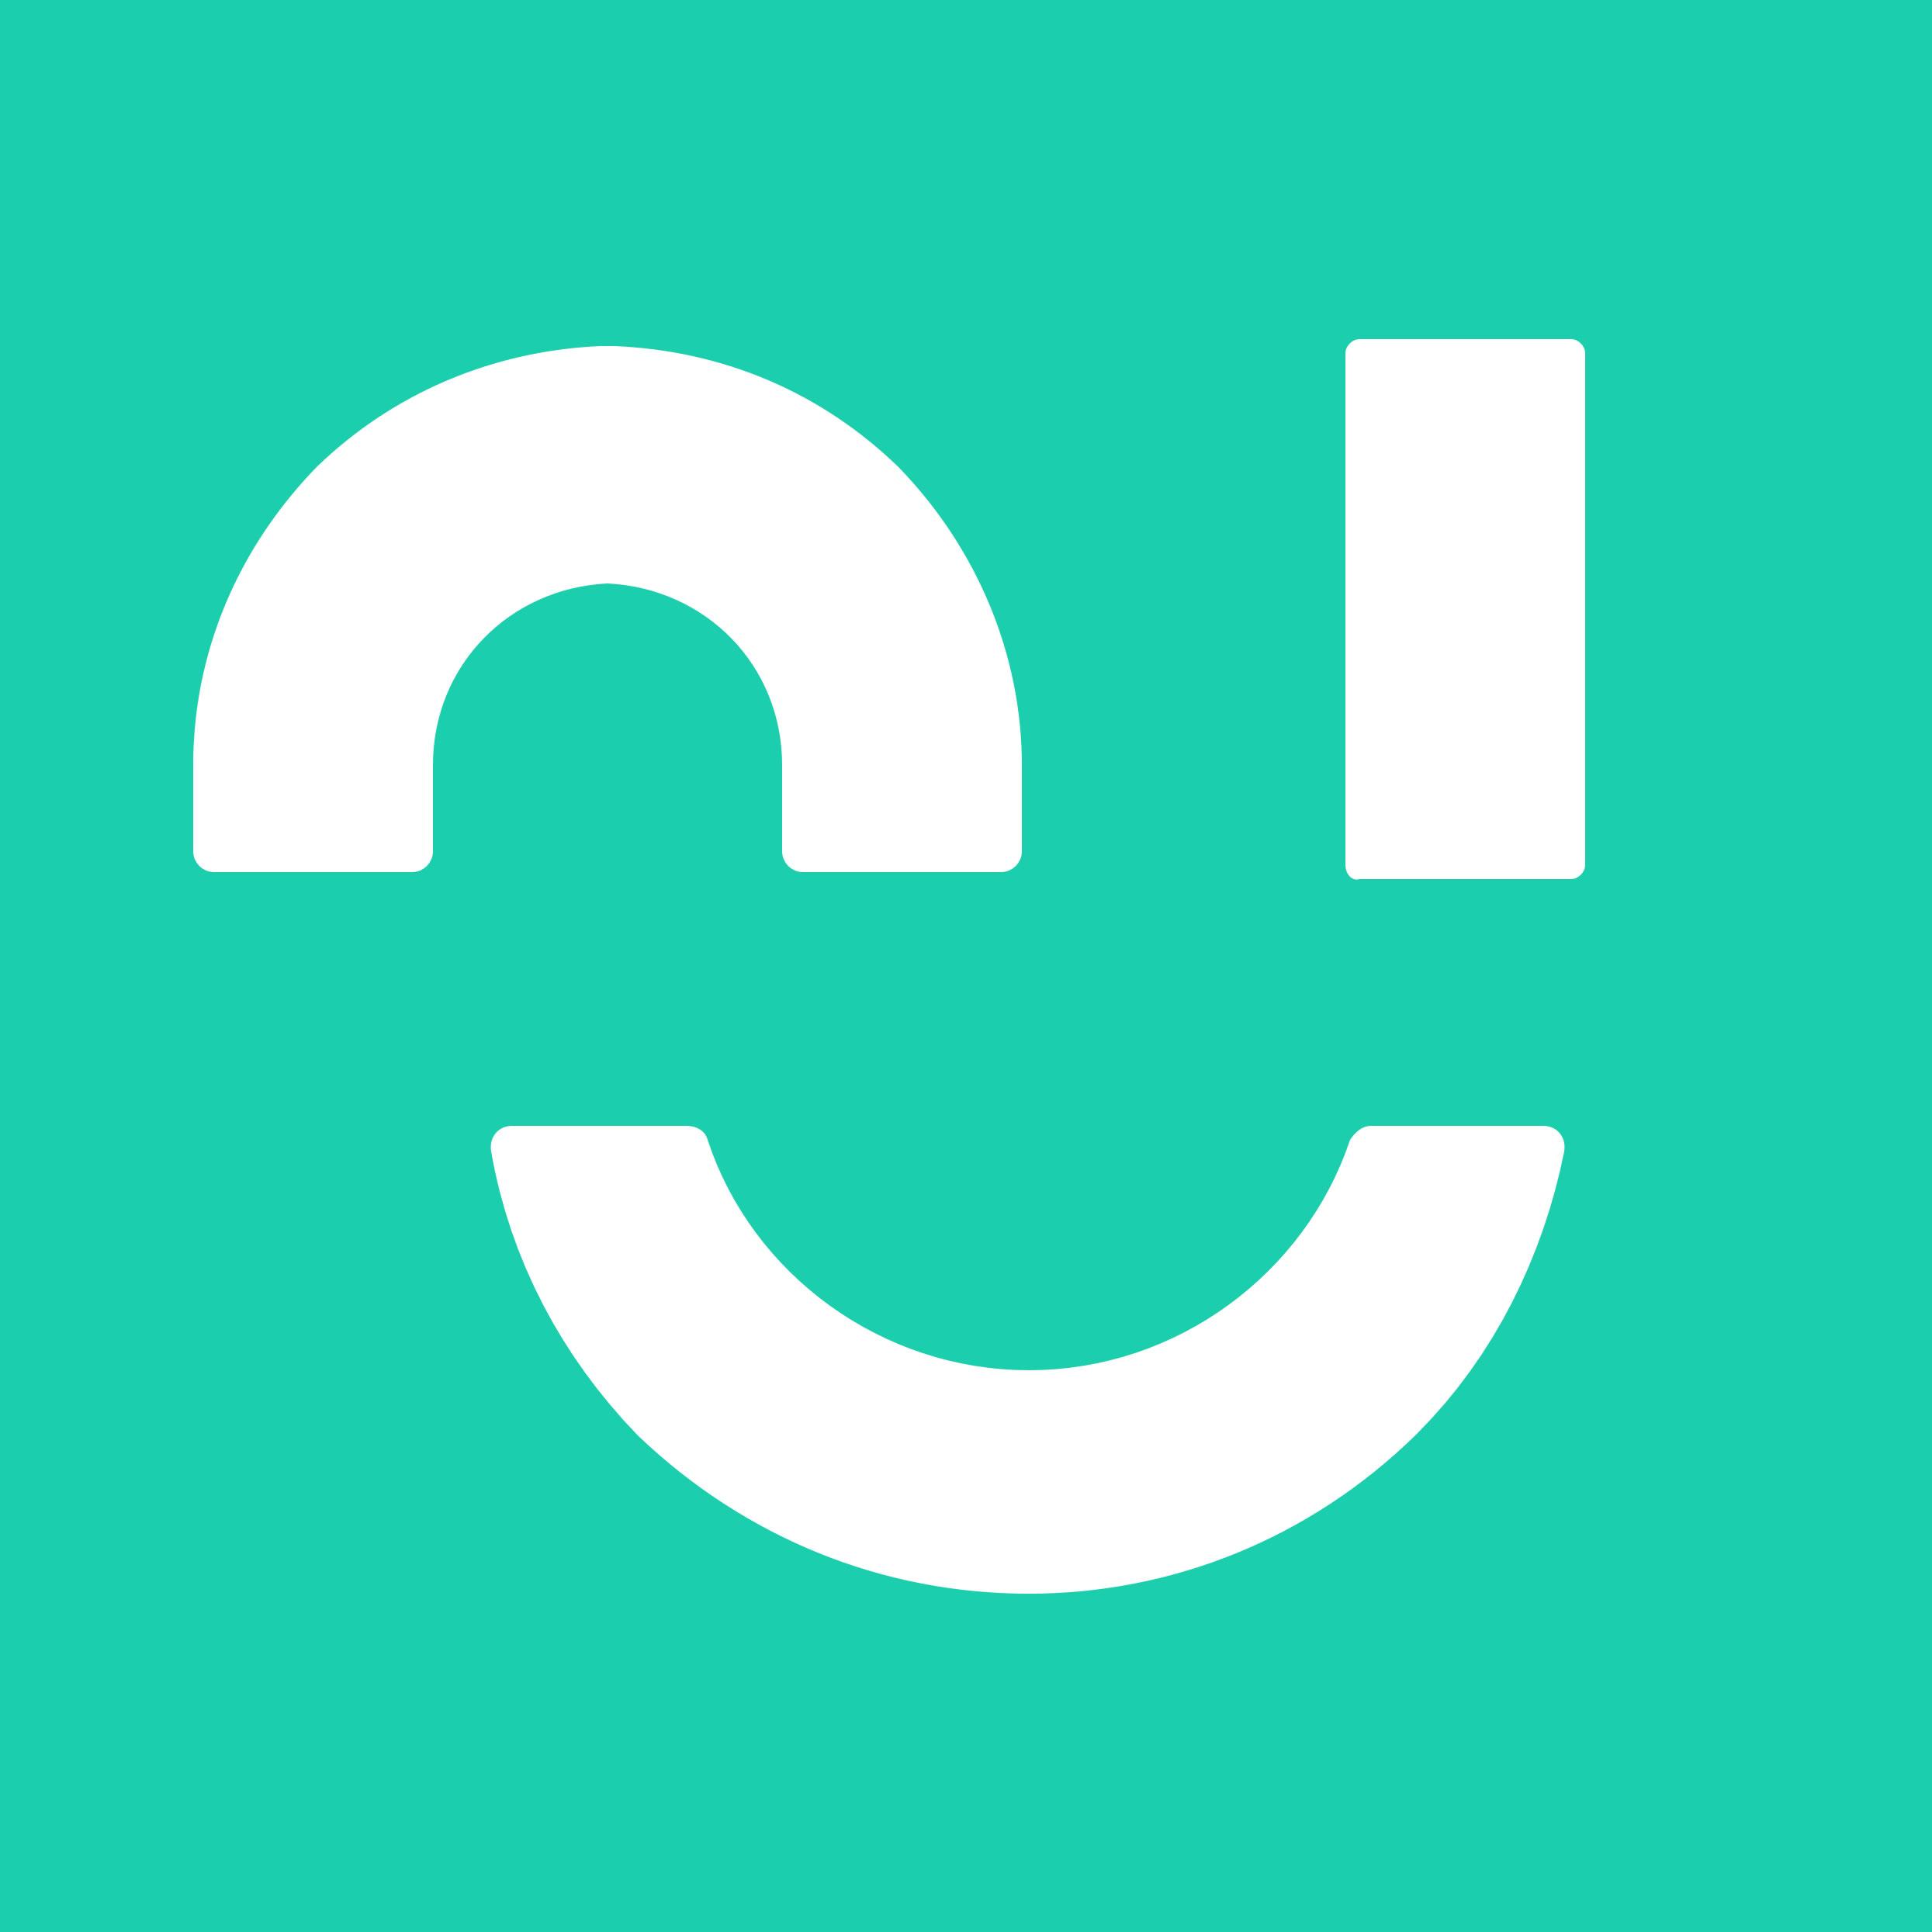 logo wink.jpg